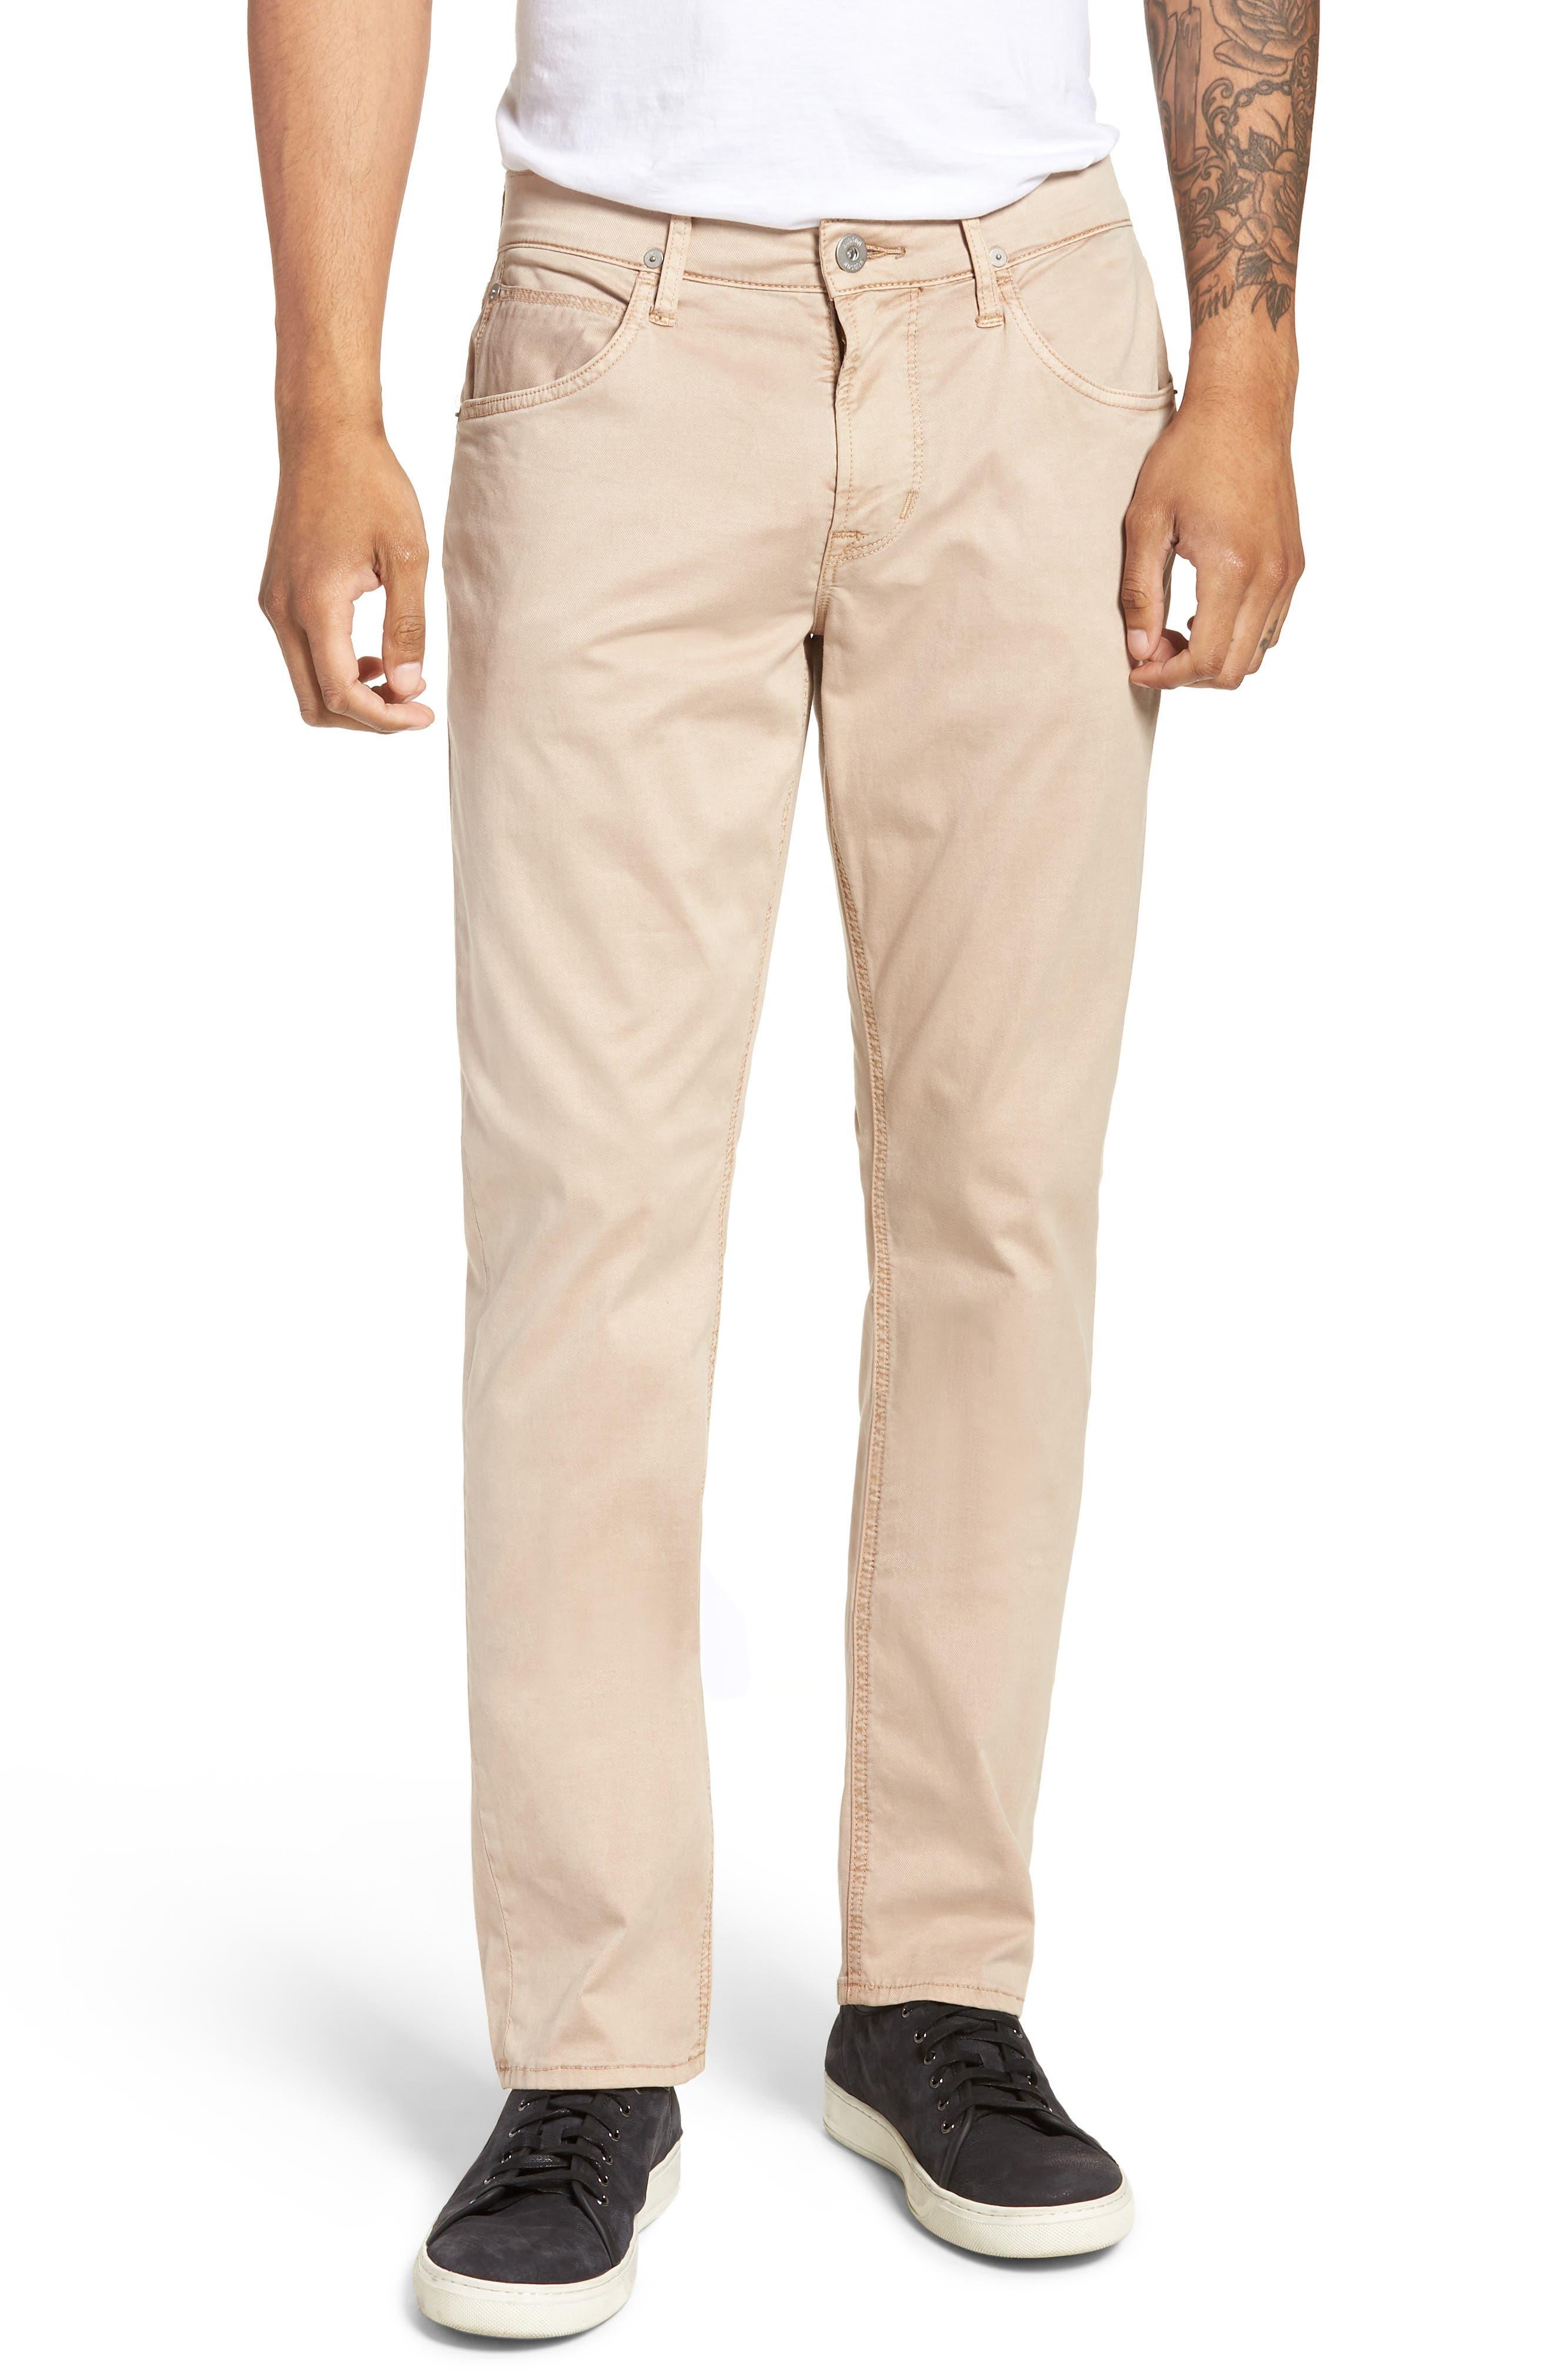 Blake Slim Fit Jeans,                             Main thumbnail 1, color,                             250